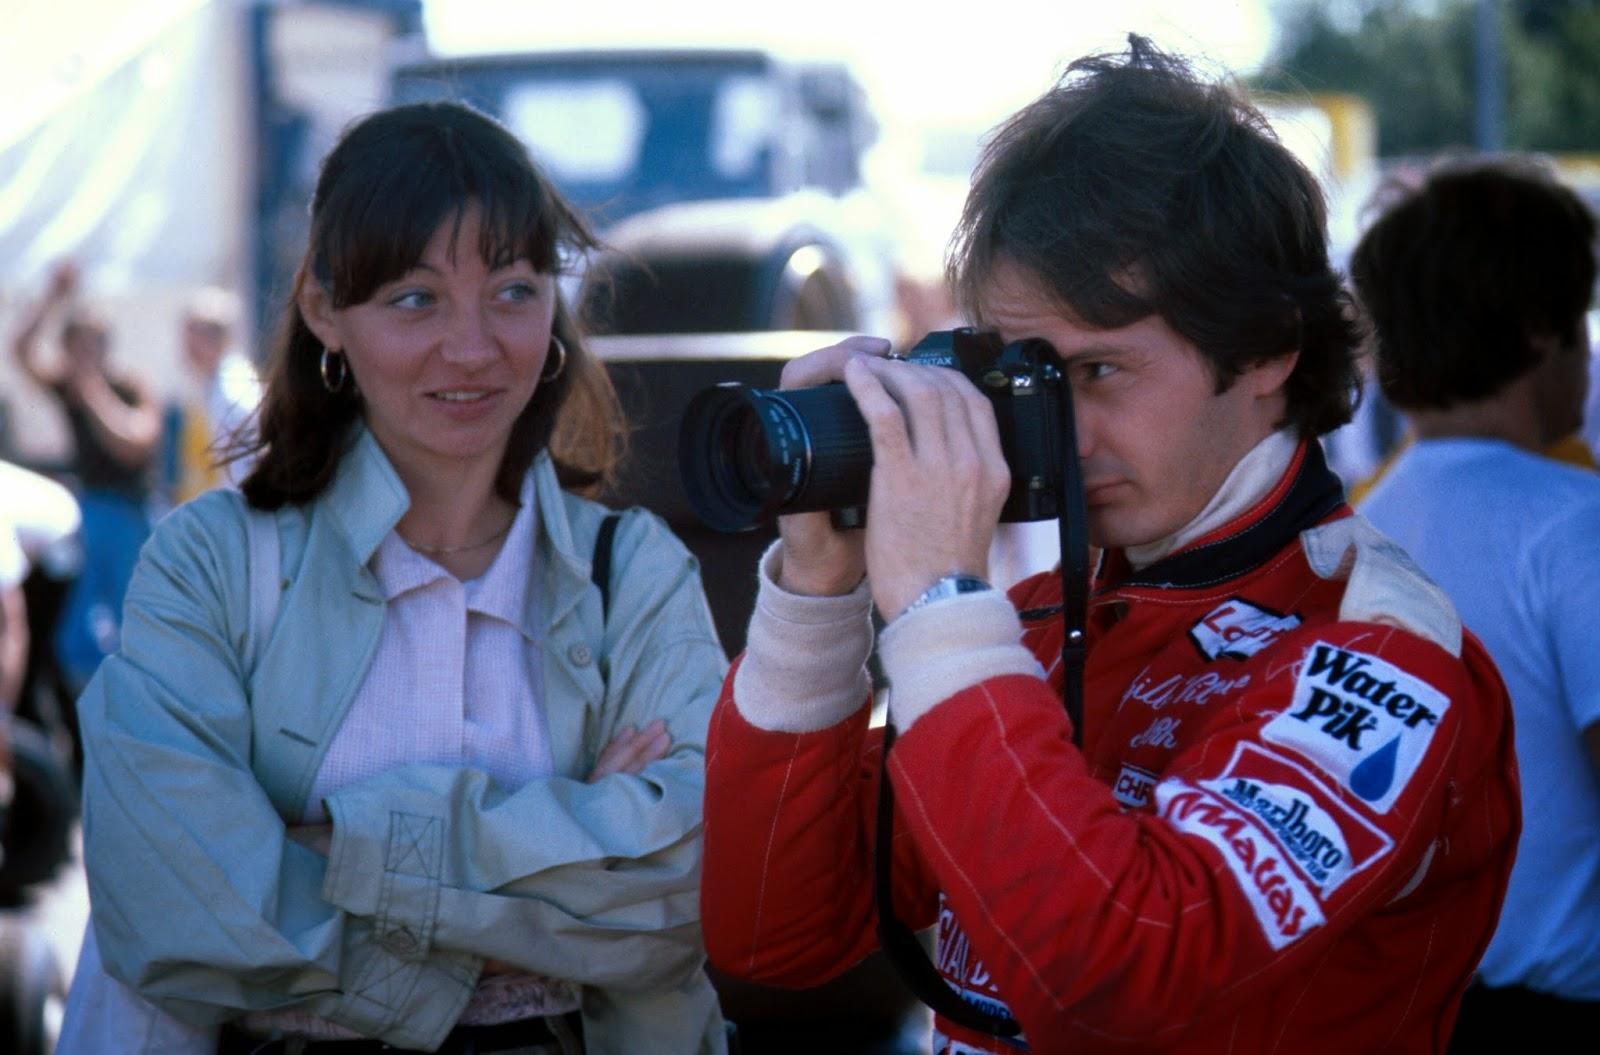 This Day In Canadian Motorsport The Gilles Villeneuve